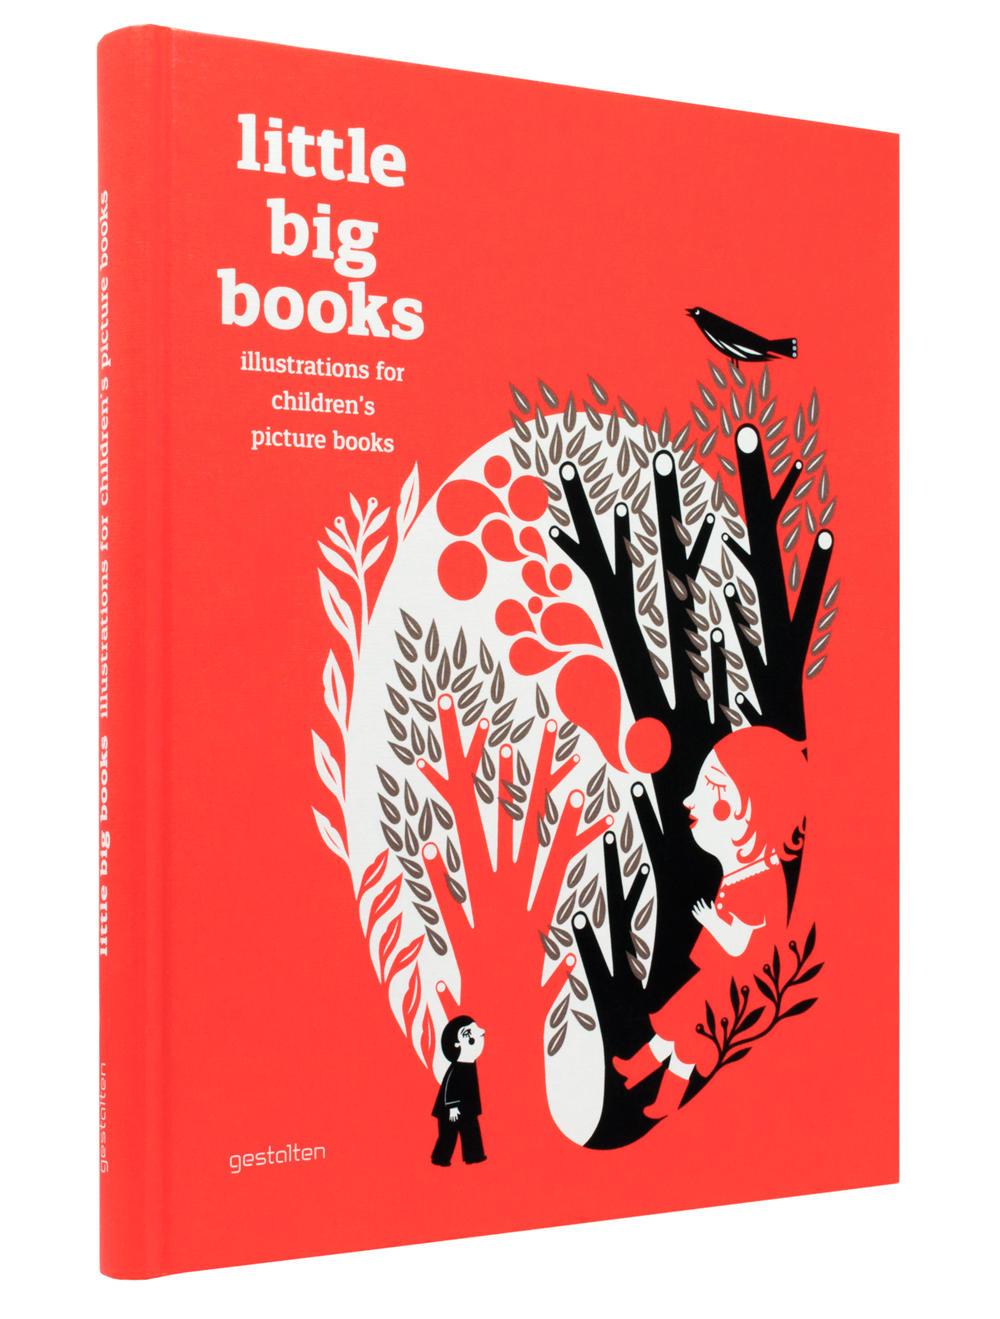 New Release: Little Big Books | Gestalten